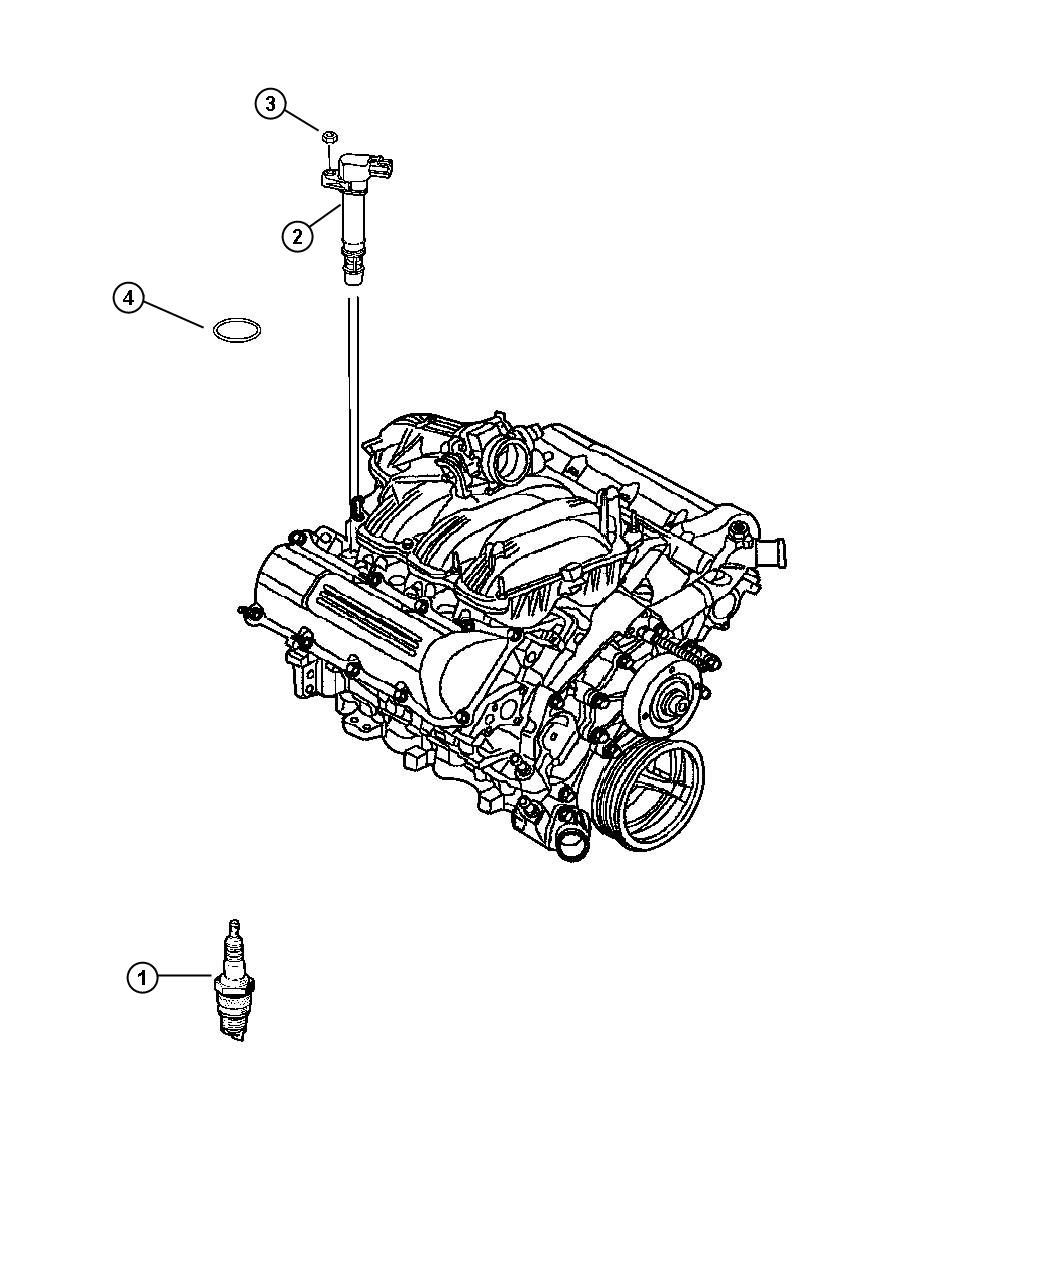 Dodge Spark Plug Suggested